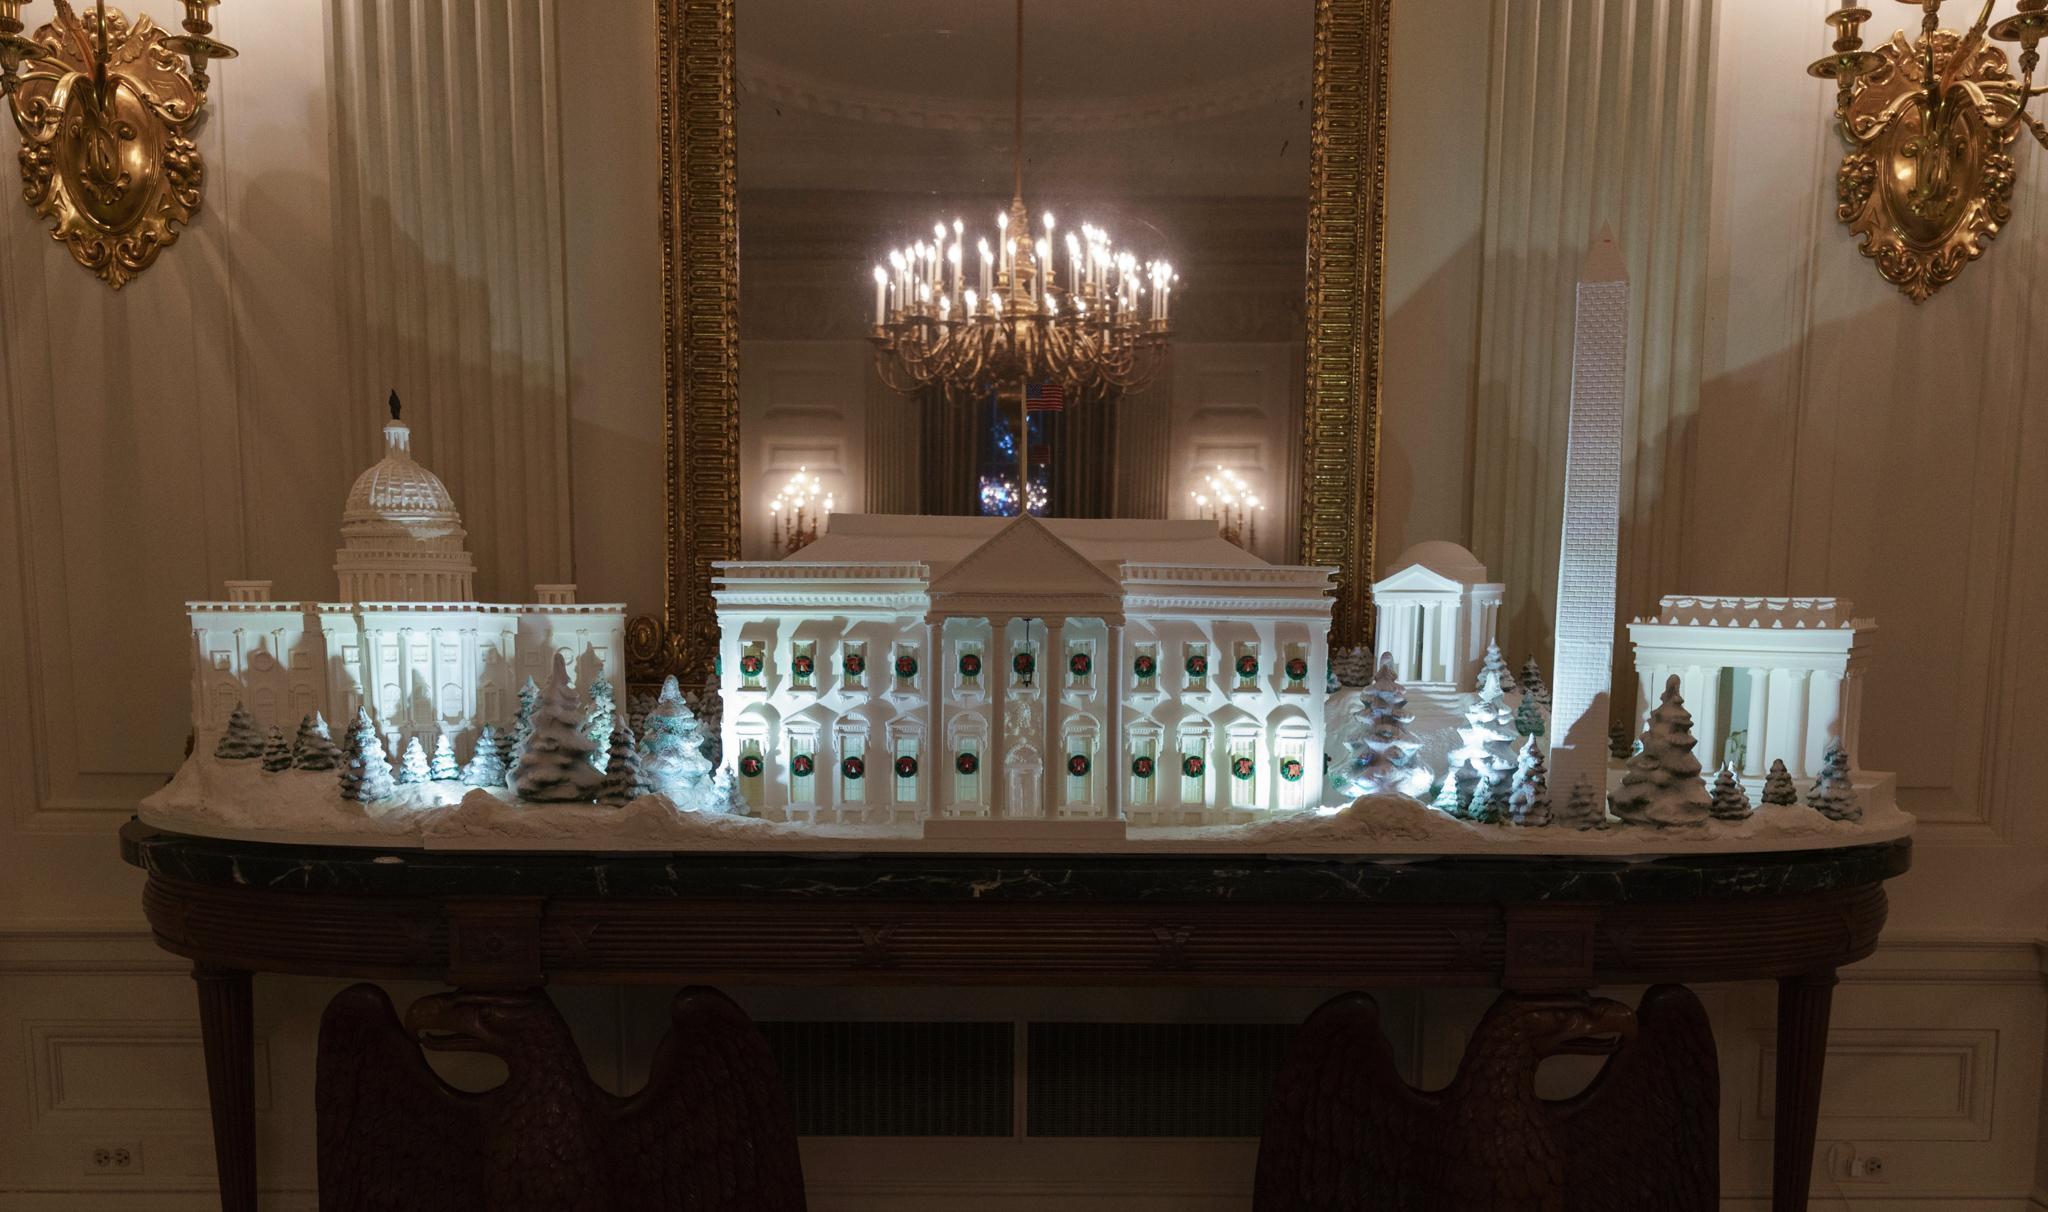 White models of buildings sitting on table (© Carolyn Kaster/AP Images)